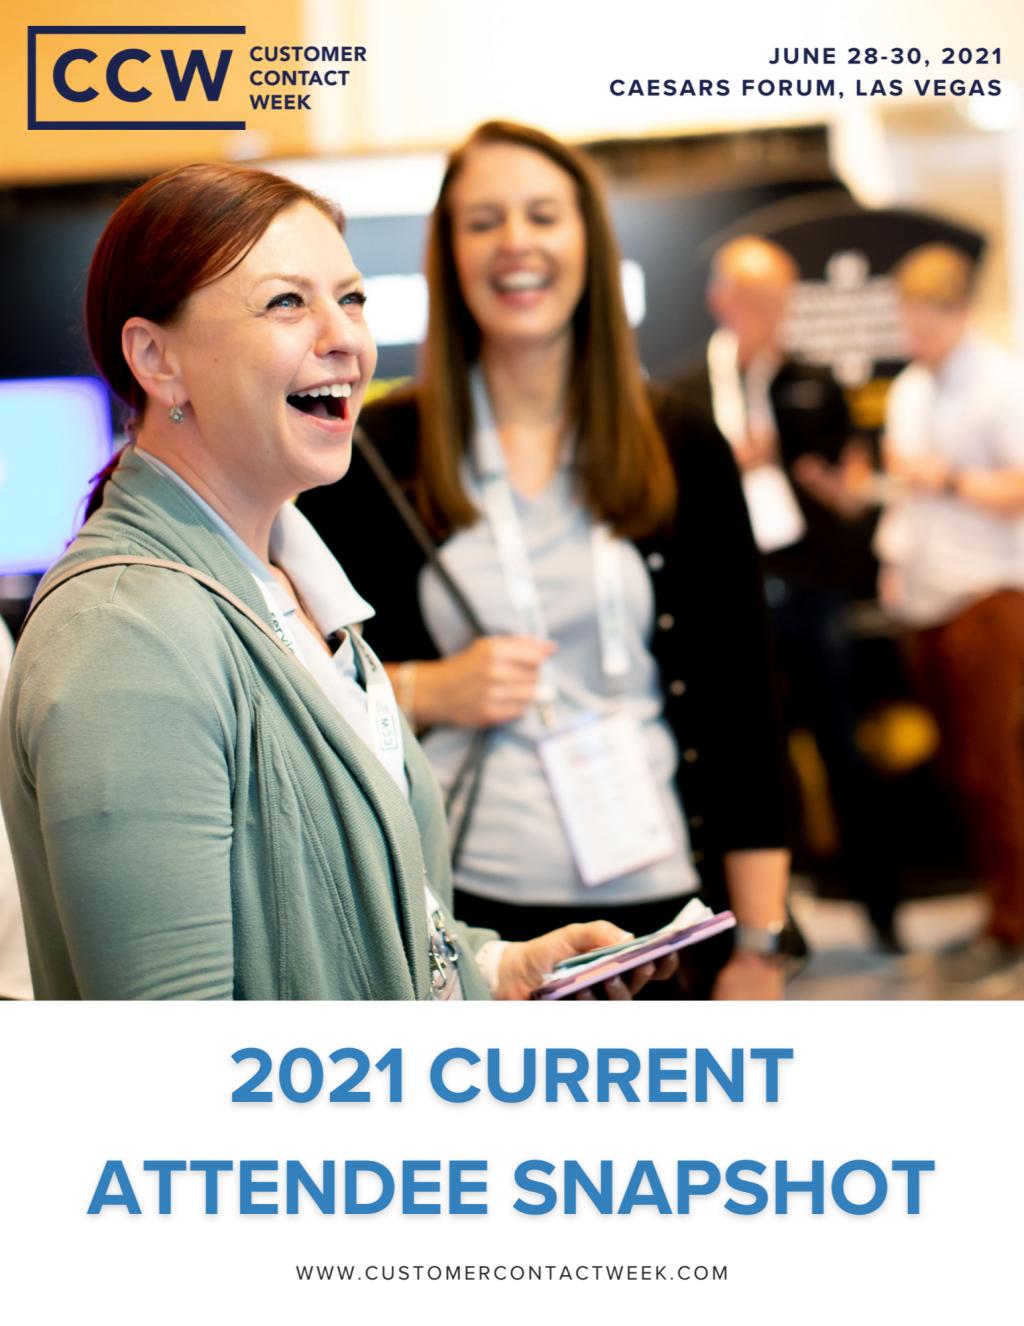 CCW Vegas 2021 Current Attendee Snapshot